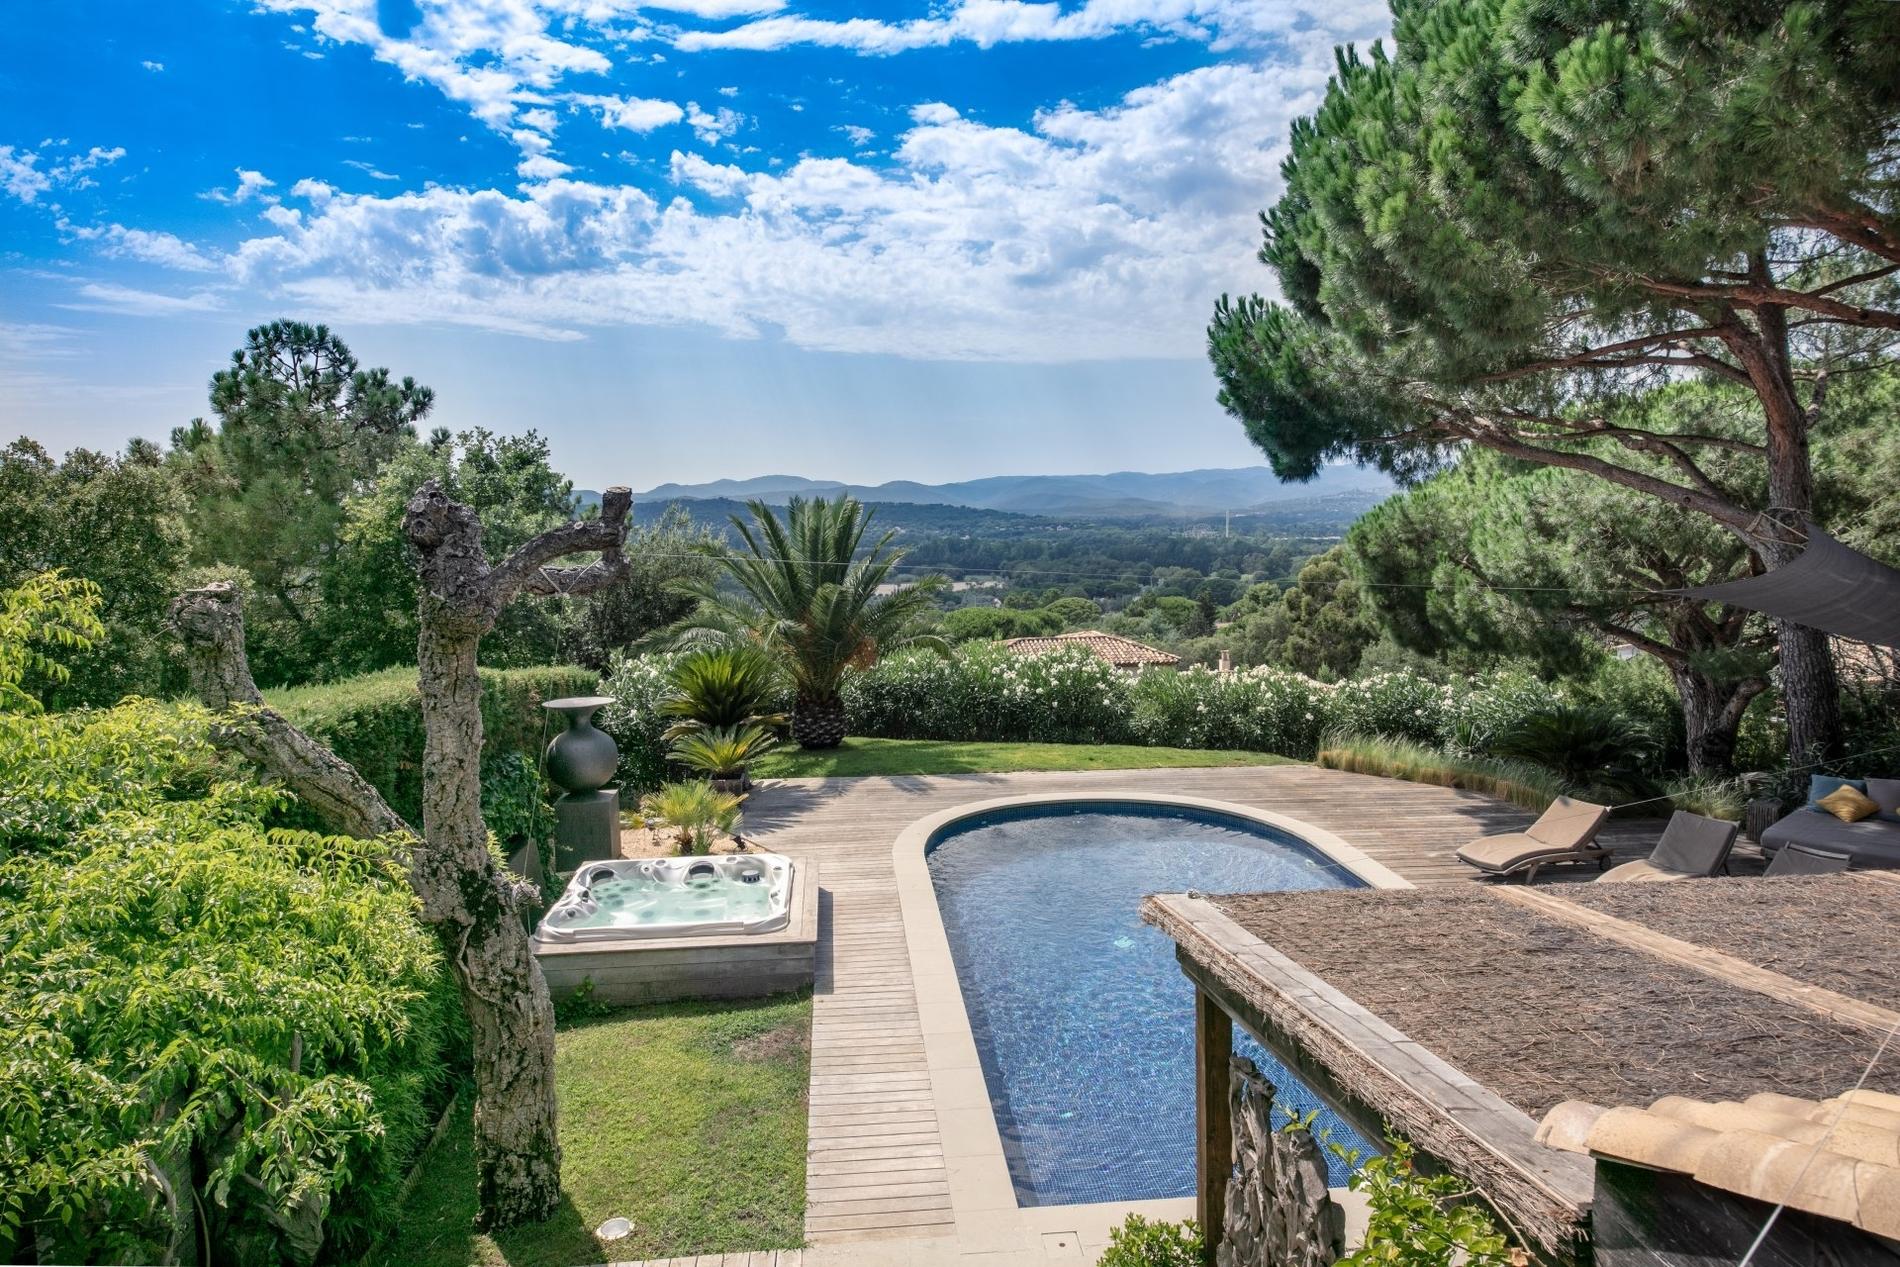 villa-atypique-bardage-bois-a-vendre-gassin-terrasse-jacuzzi-piscine-jardin